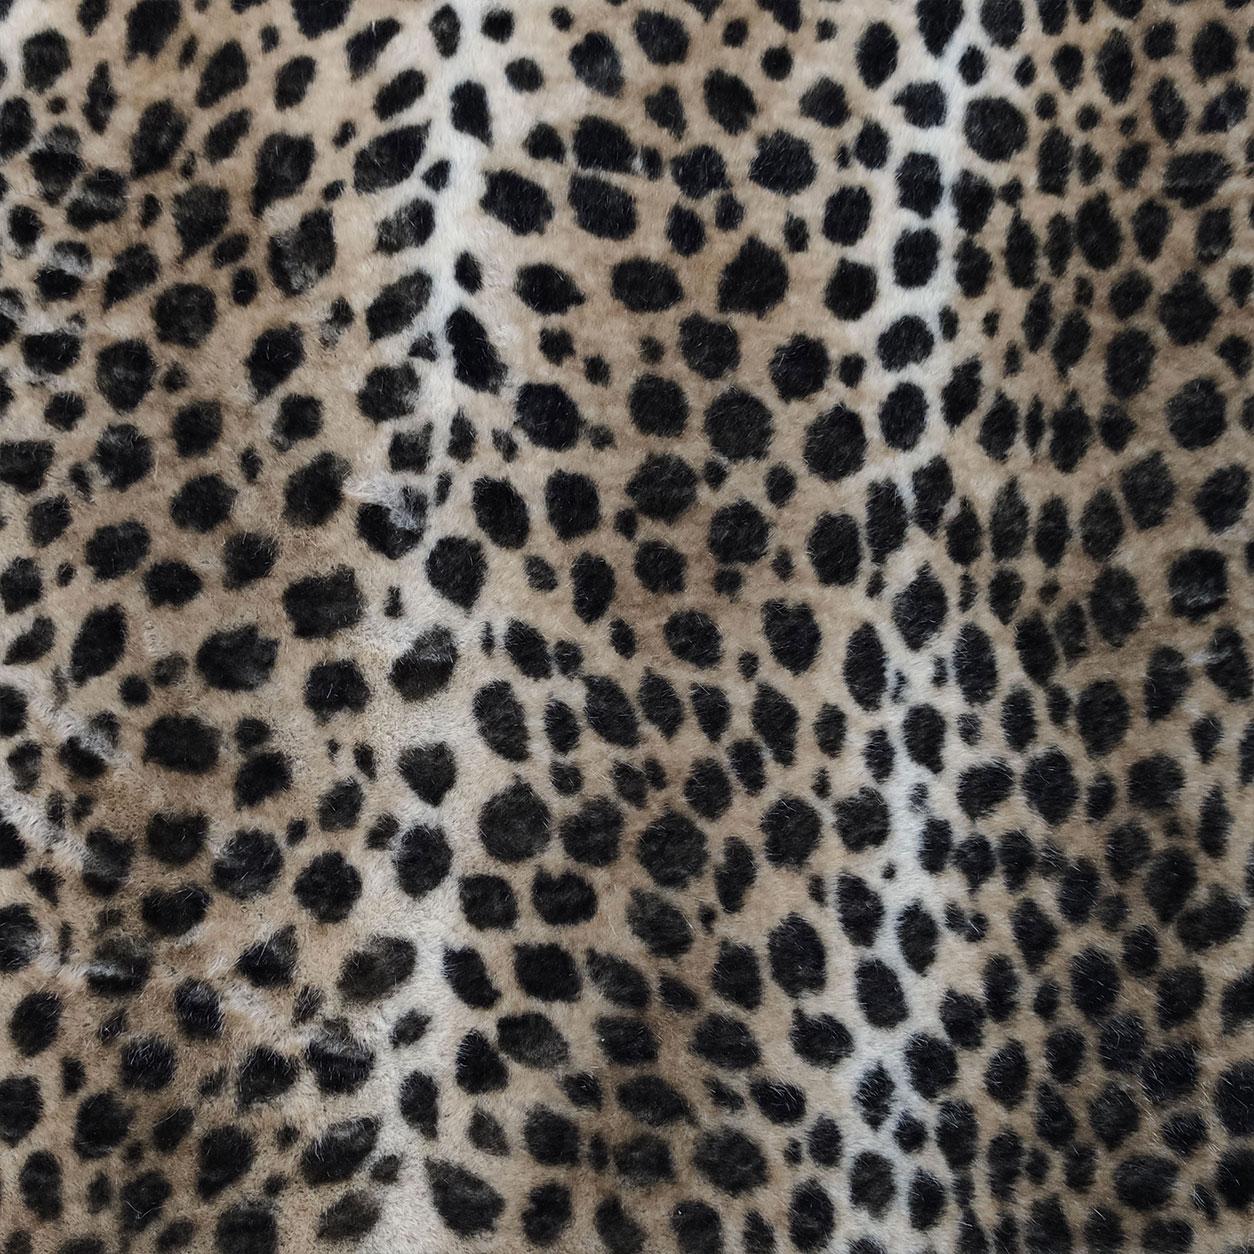 Ecopelliccia Leopardata